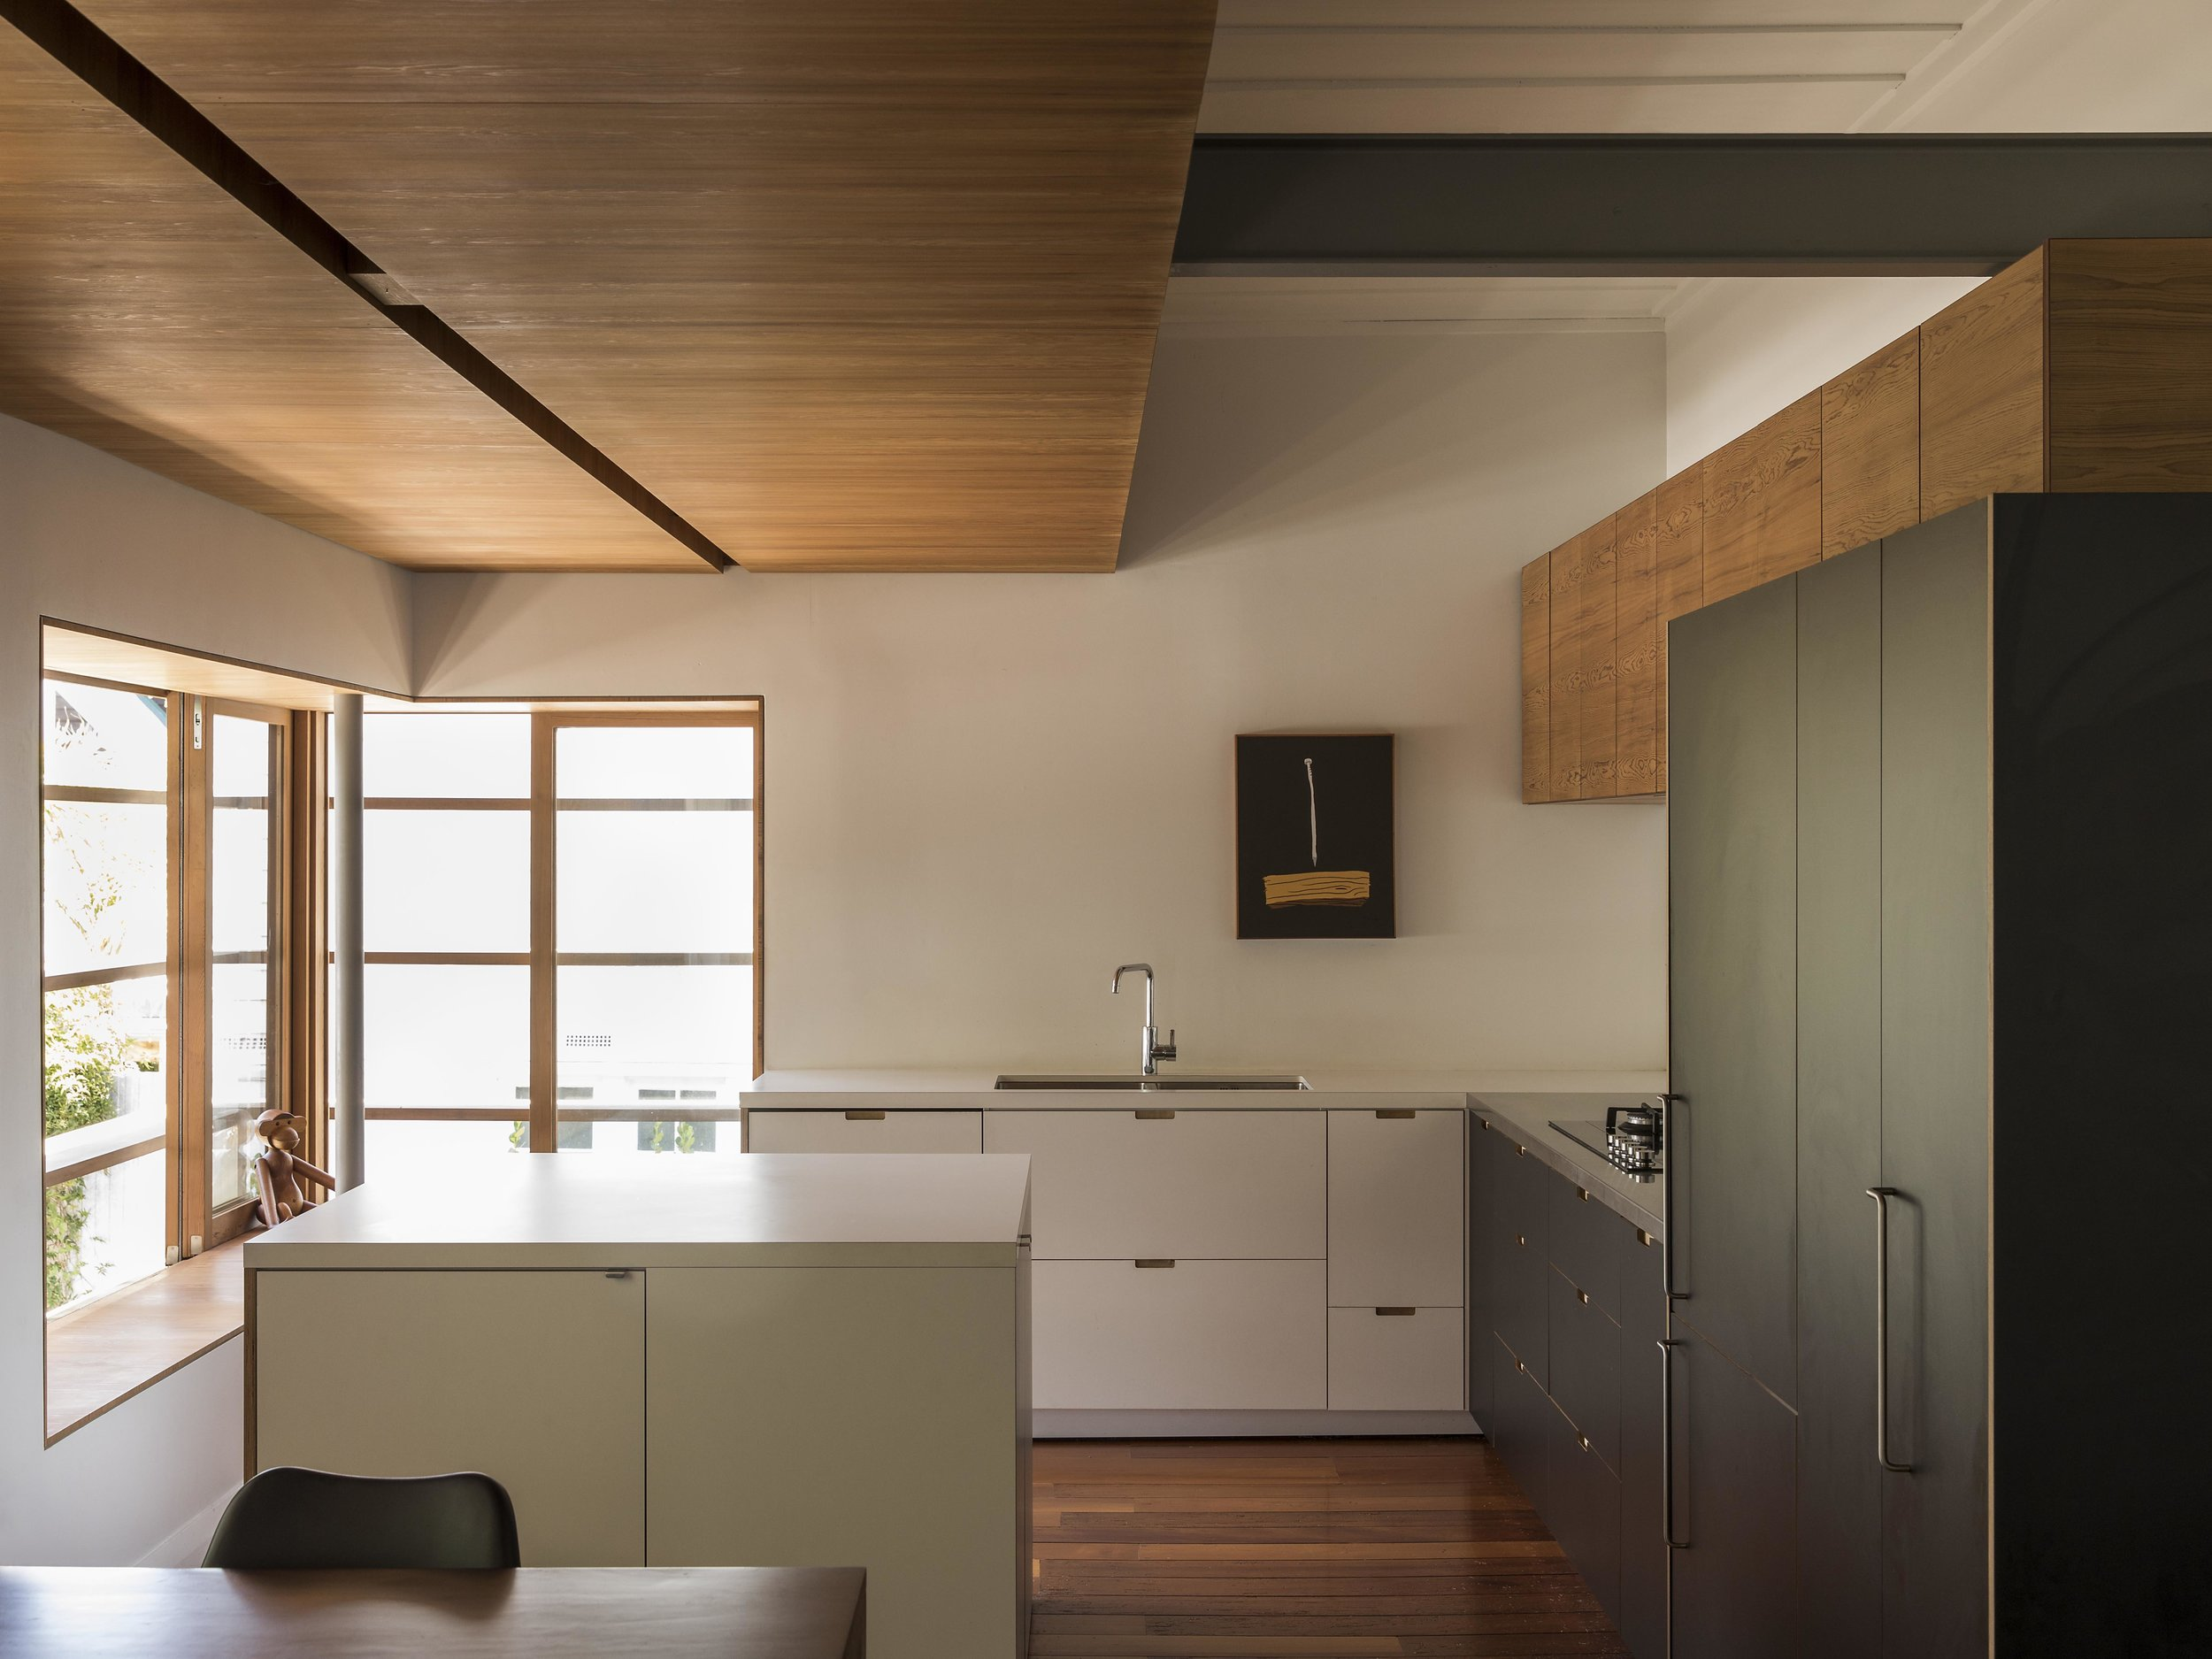 Christopber-Beer-Architect-Designer-Object-Space-Auckland-08.jpg